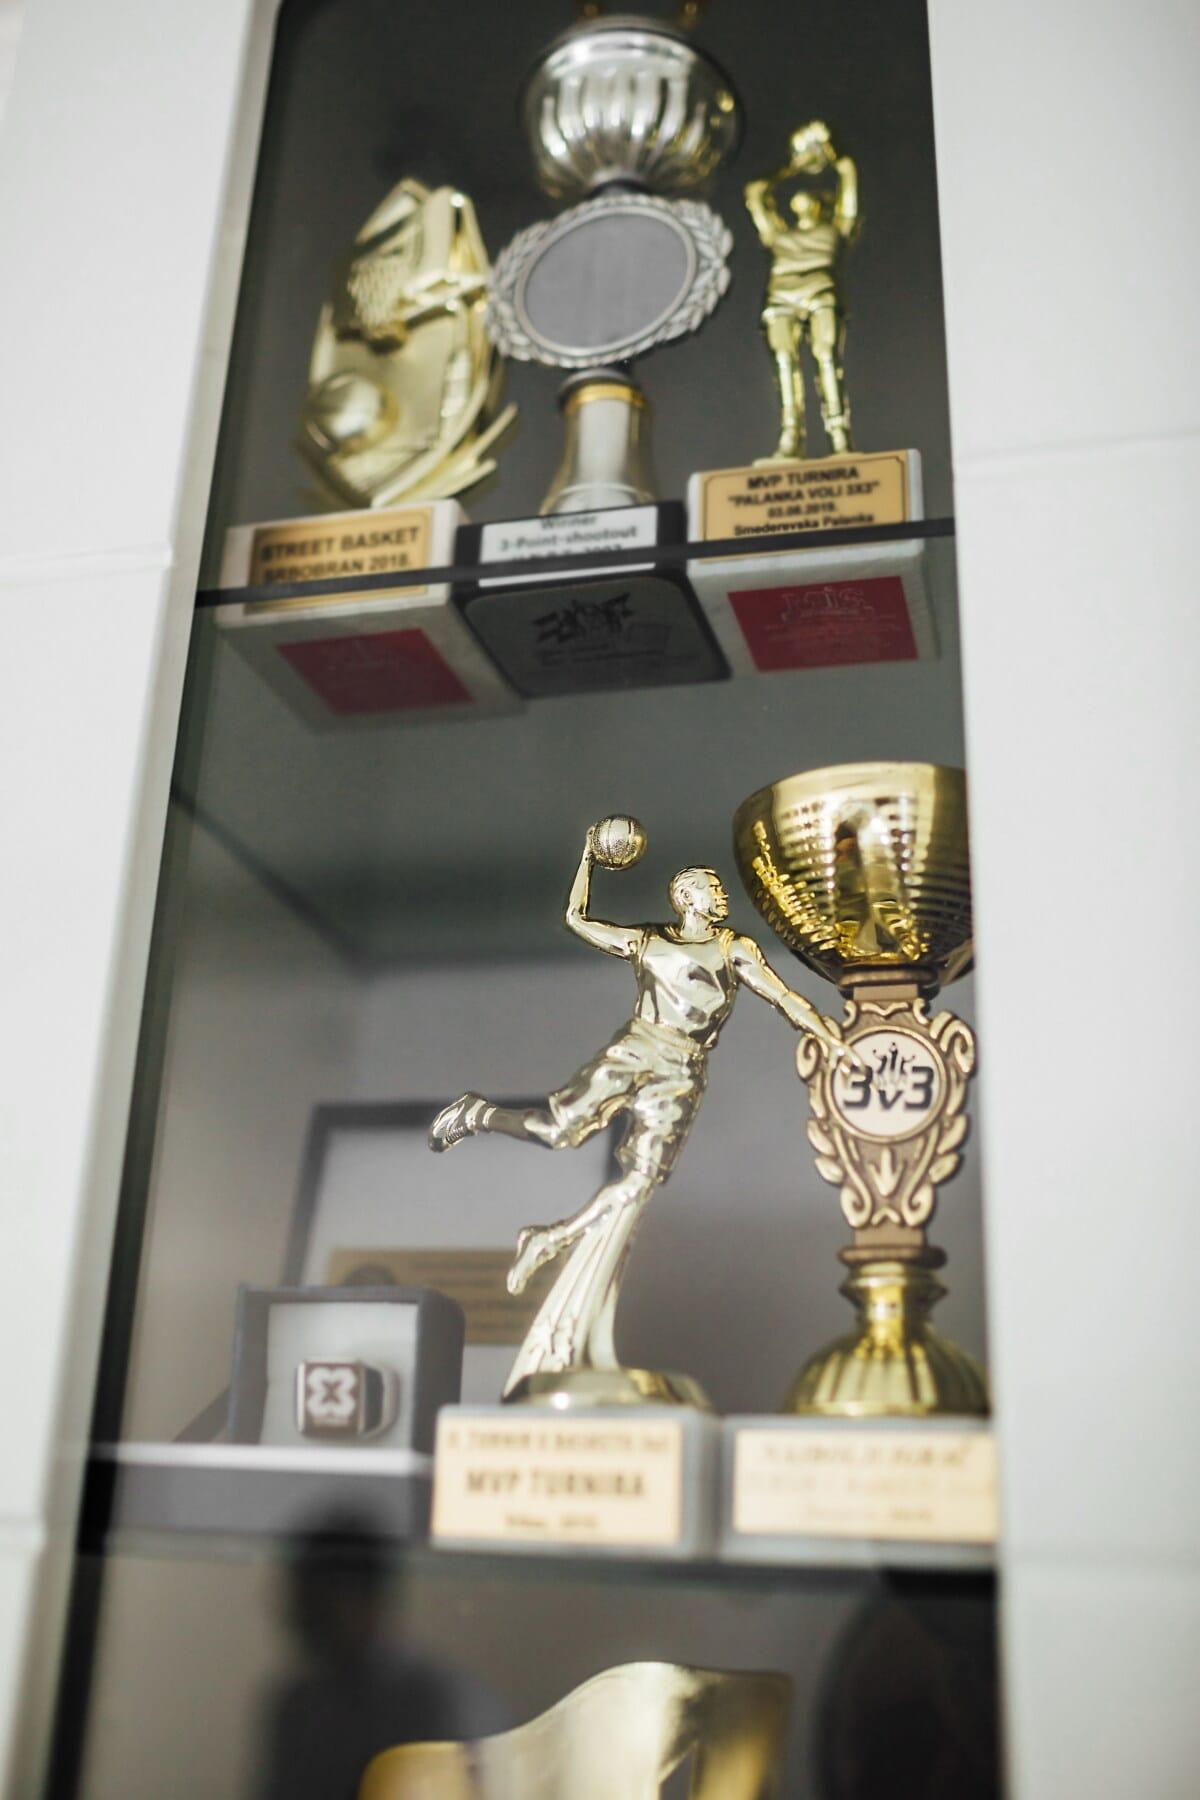 achievement, memorabilia, award, sport, competition, museum, sculpture, bronze, victory, exhibition